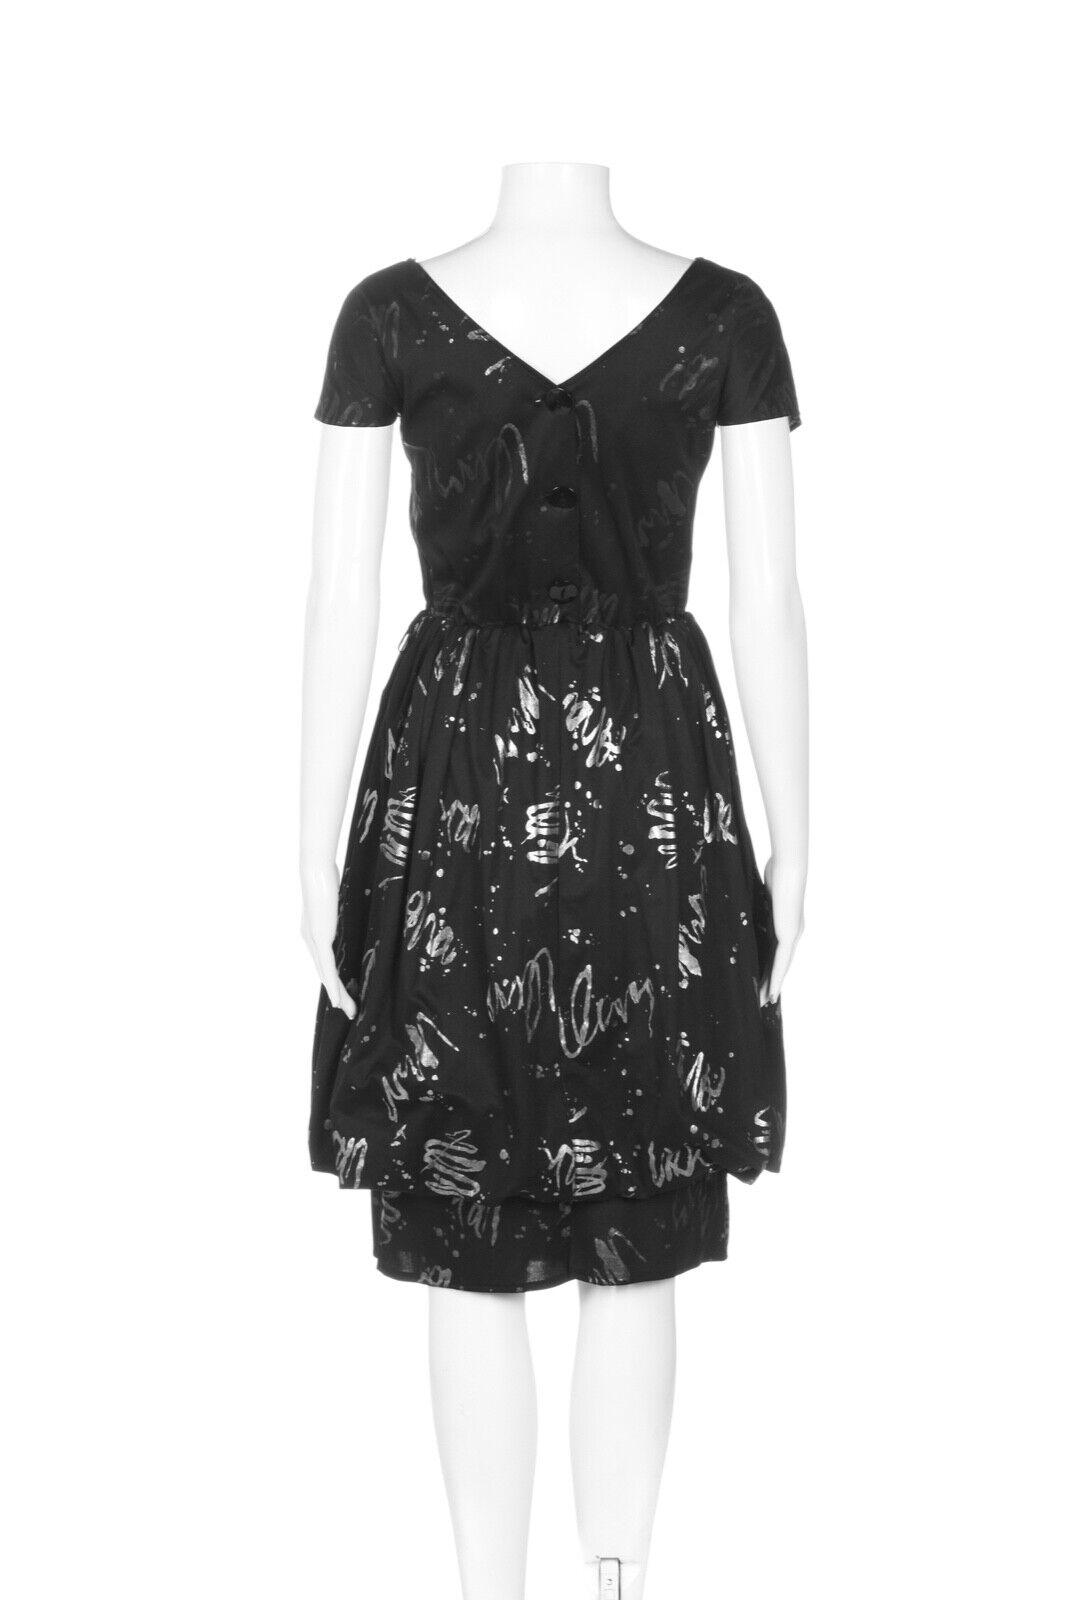 HANDMADE Balloon Dress Small Black Silver High Ne… - image 3